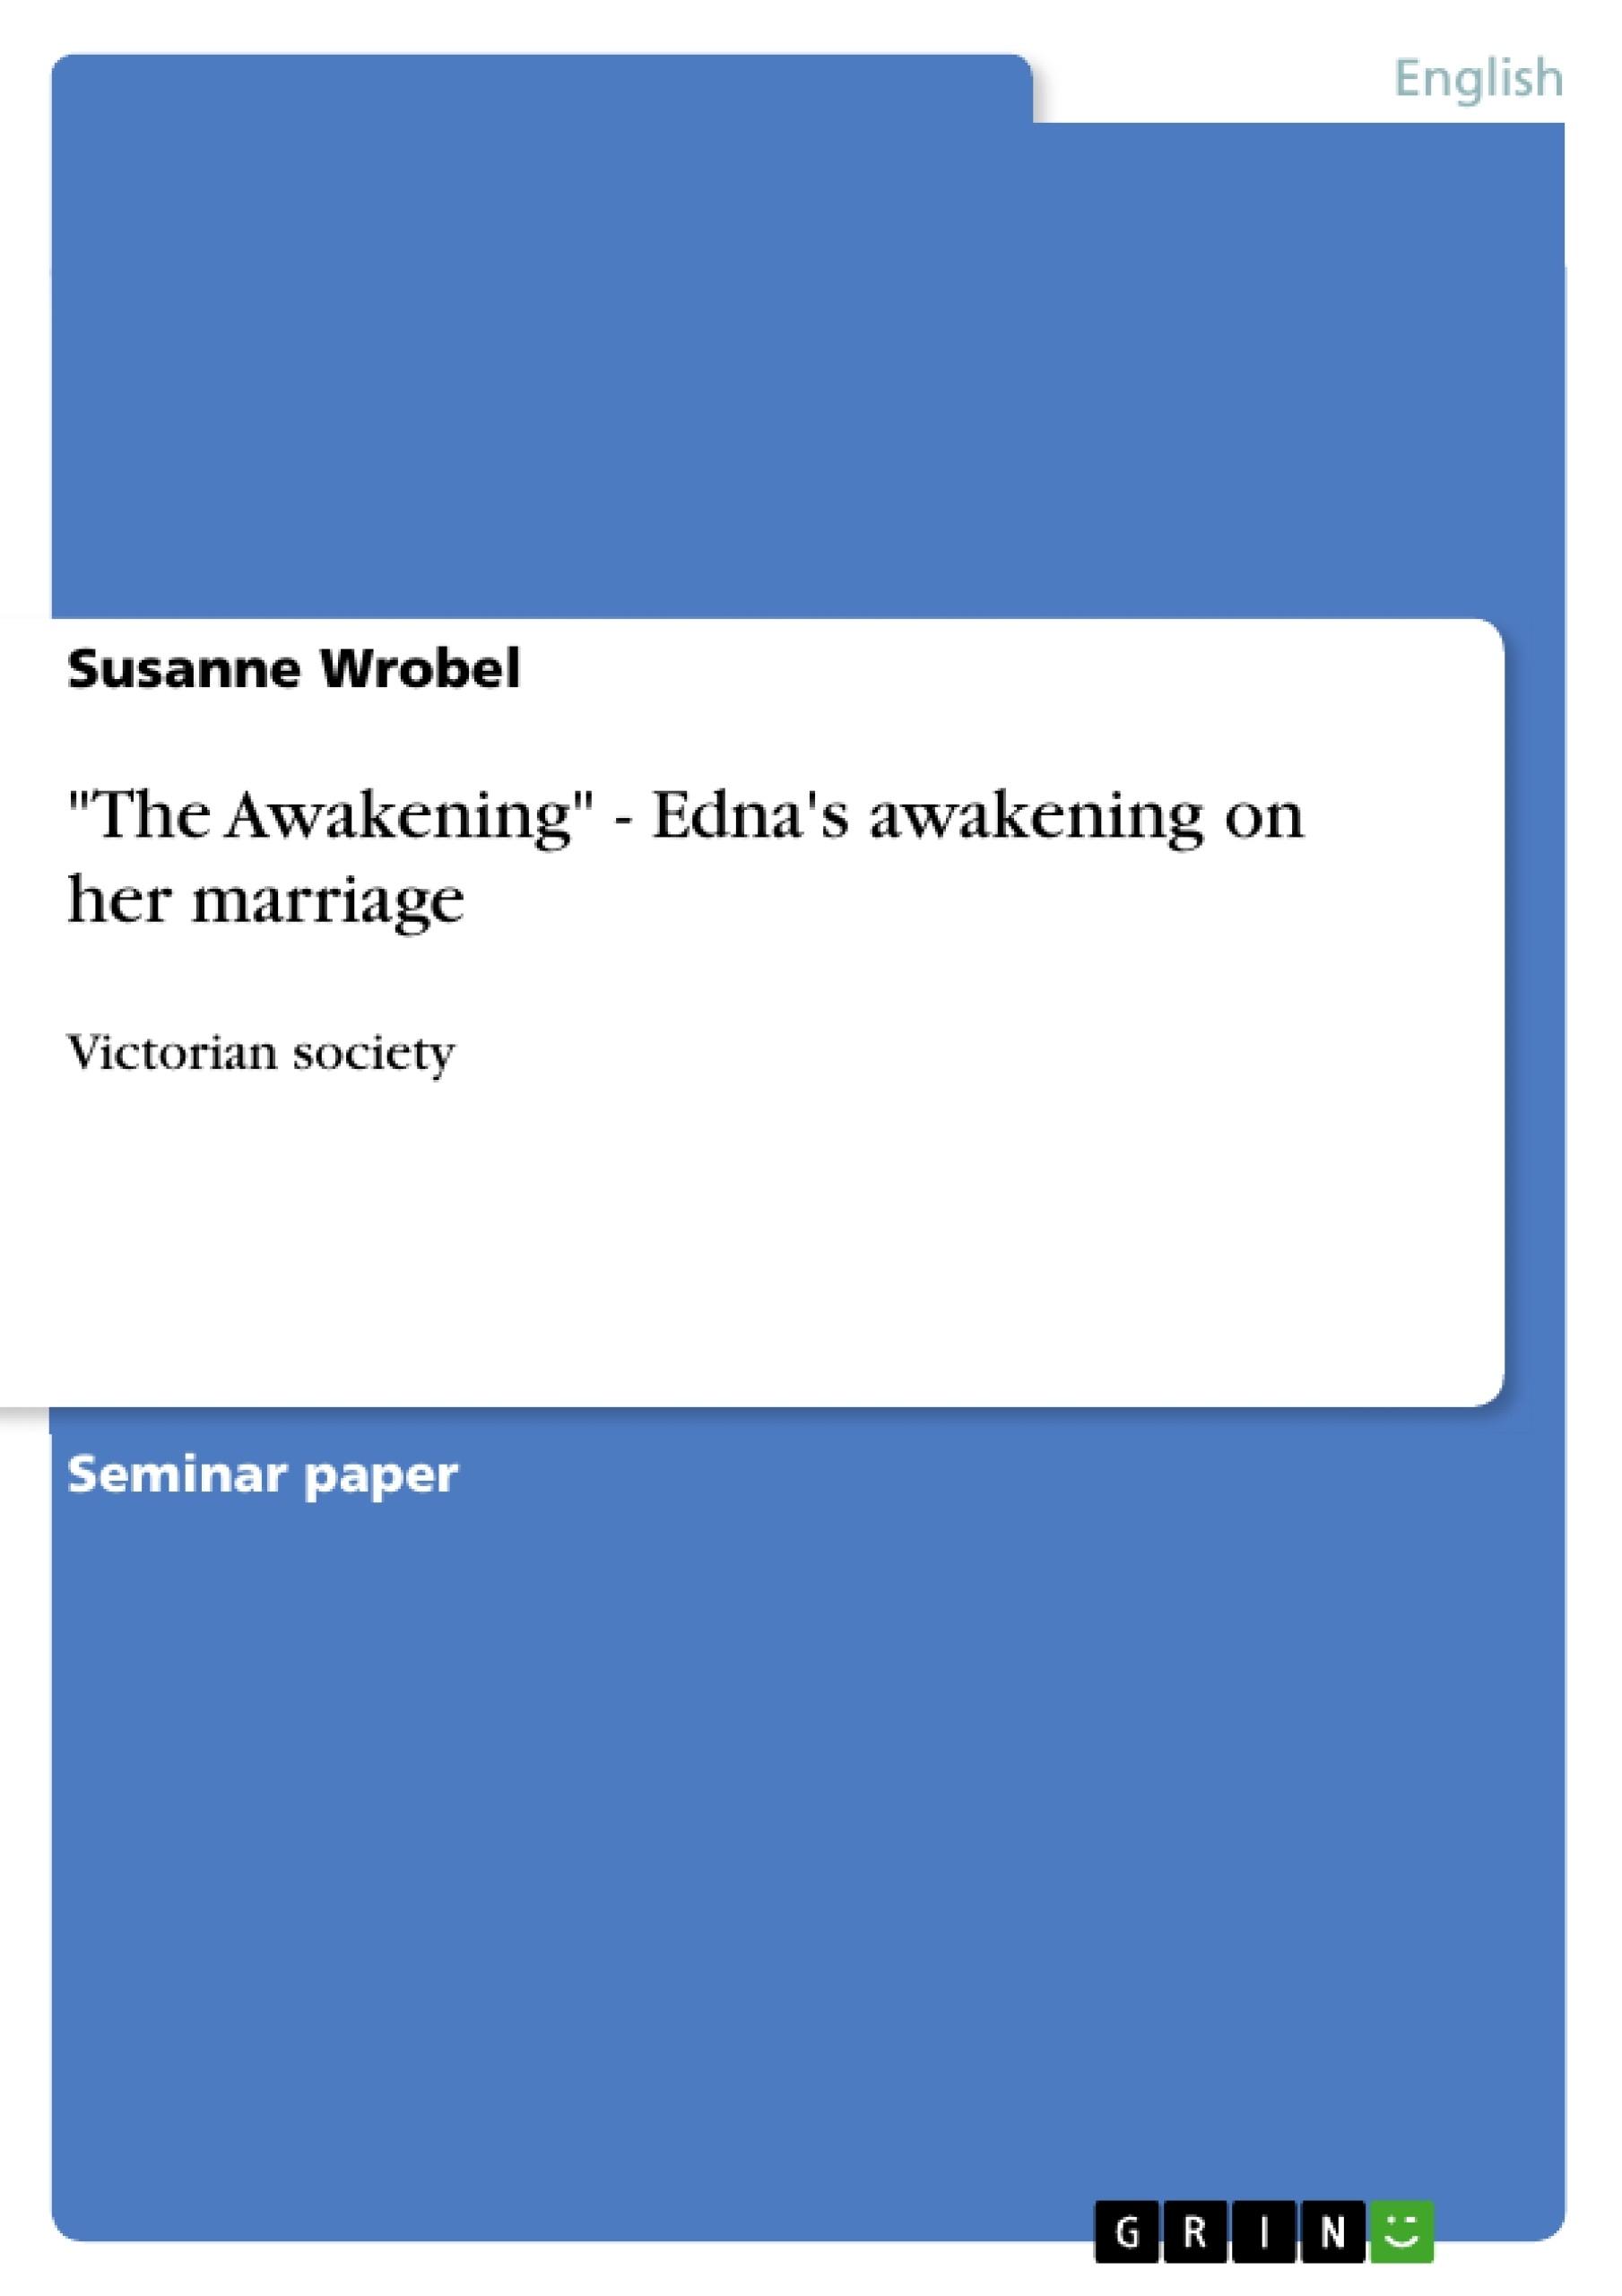 the awakening edna s awakening on her marriage publish your the awakening edna s awakening on her marriage publish your master s thesis bachelor s thesis essay or term paper